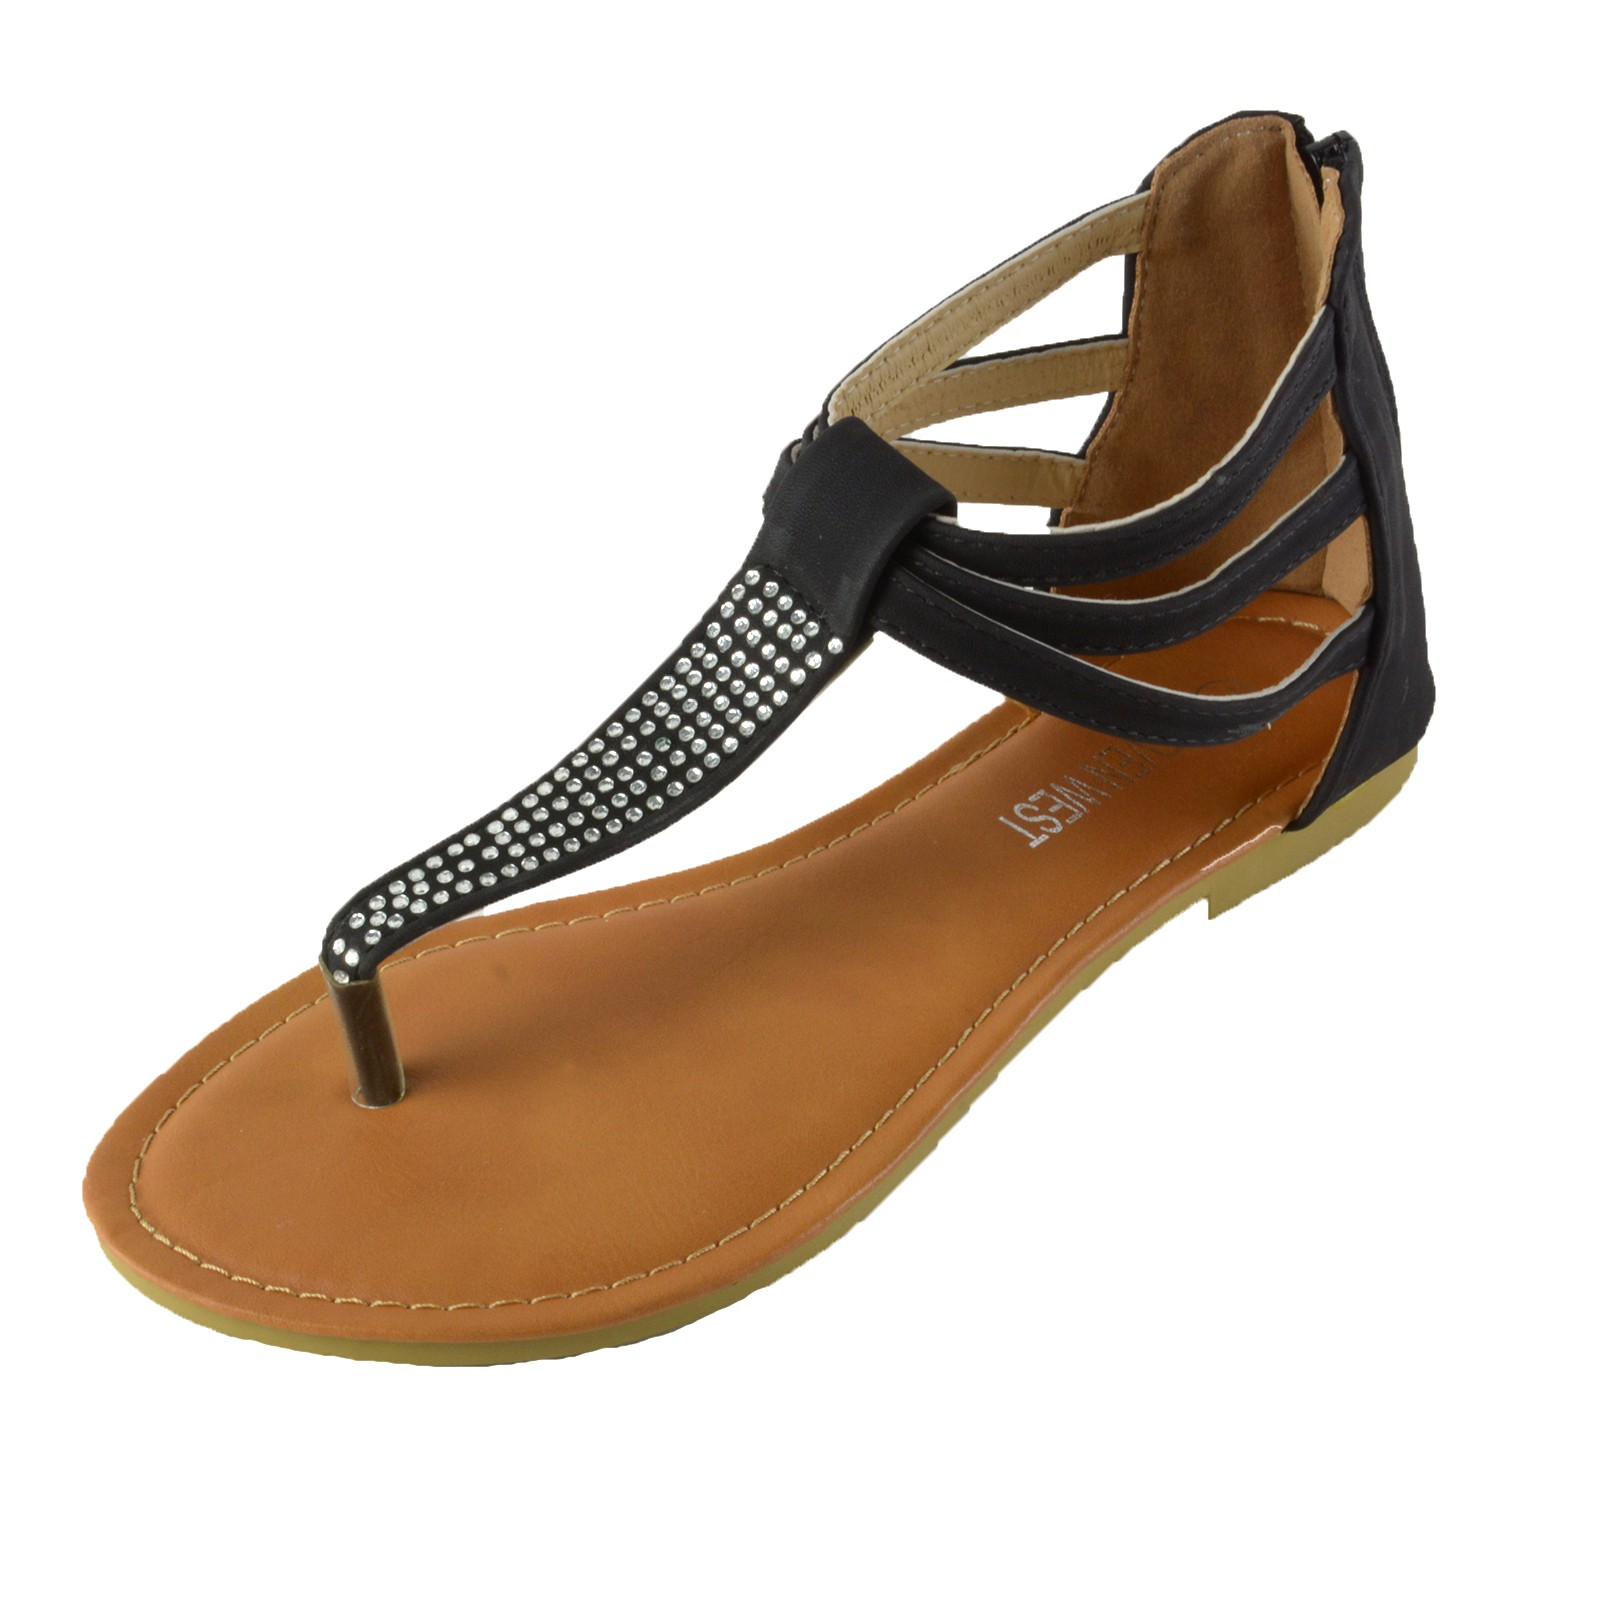 c0a40086286 Women s Rhinestone T-Strap Thong Ankle Strap Back Zip Gladiator Flat ...